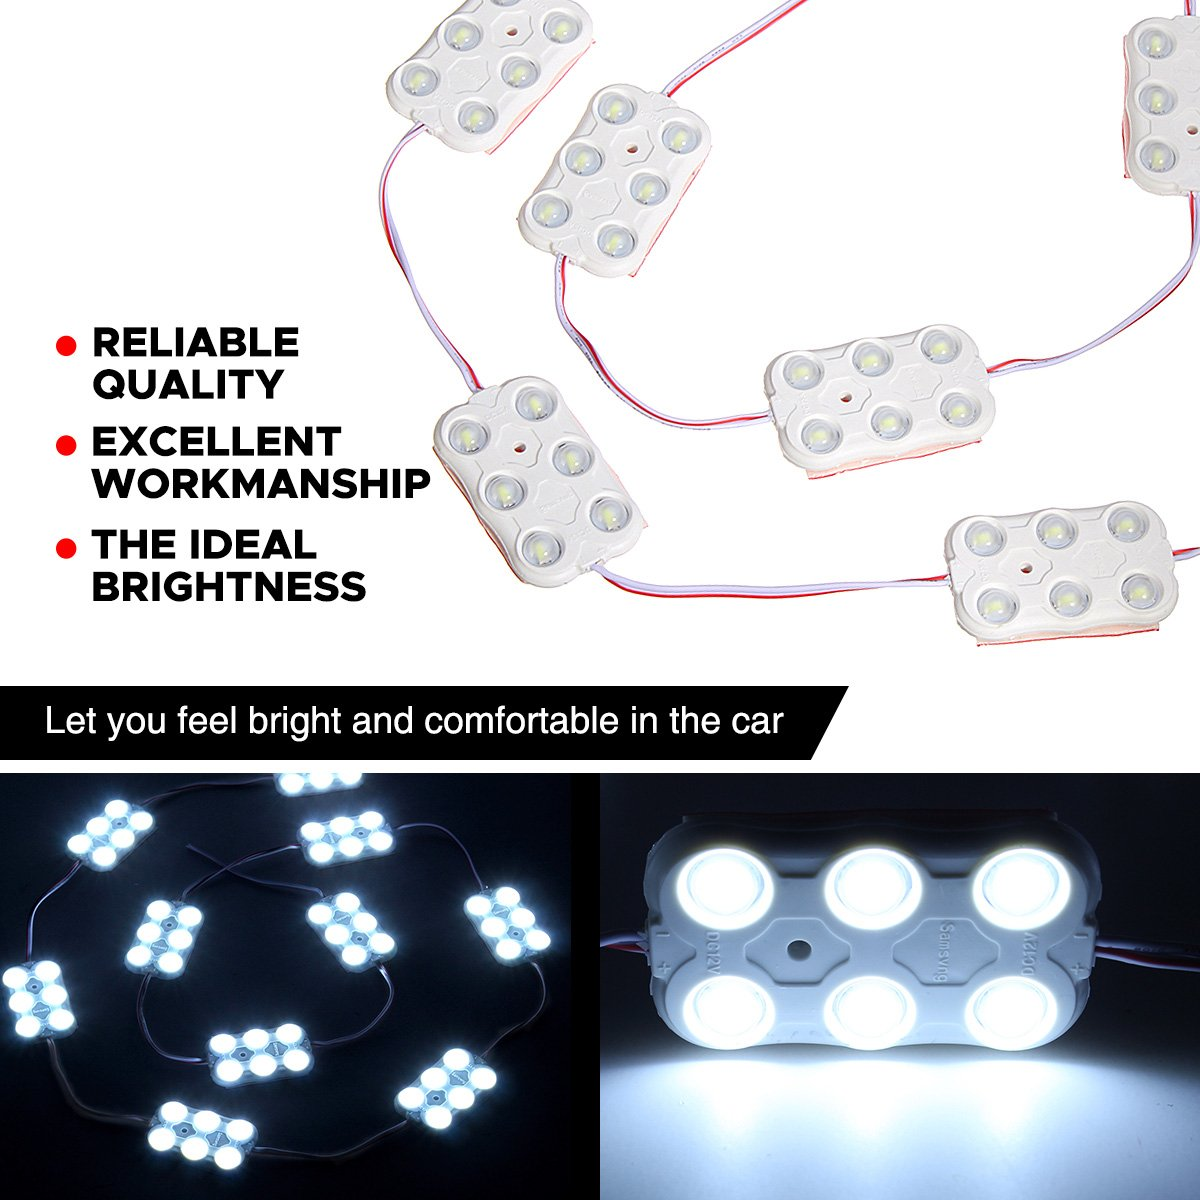 AUDEW 30 Led White Interior Lights Kit For LWB Van Lorries Sprinter Ducato Transit VW